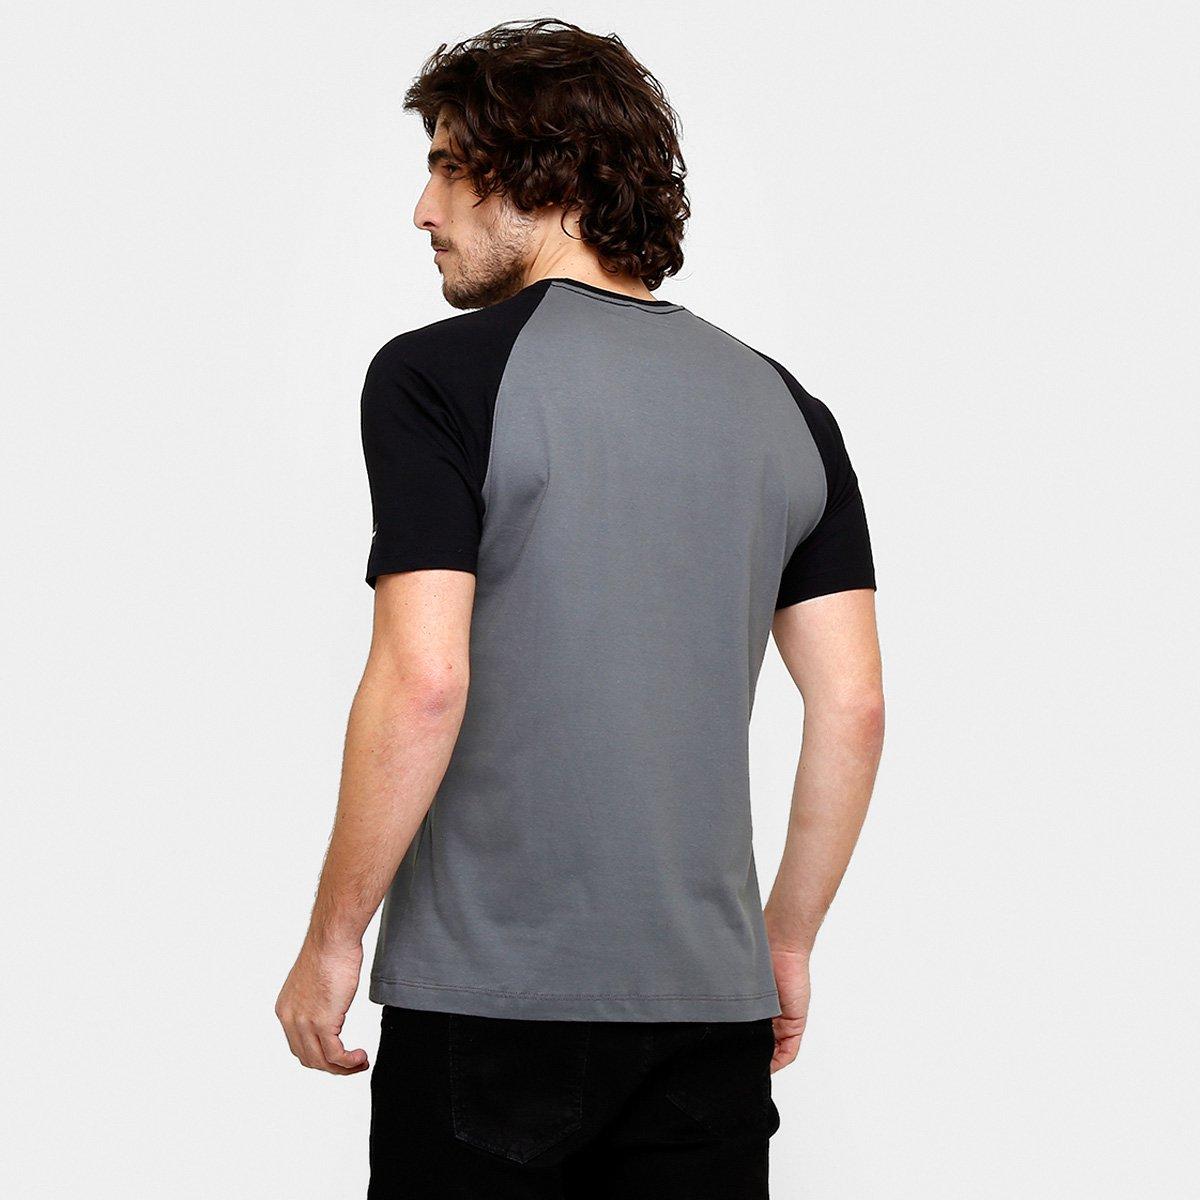 Camiseta HD Especial  Camiseta HD Especial ... 70c5e05308e2b